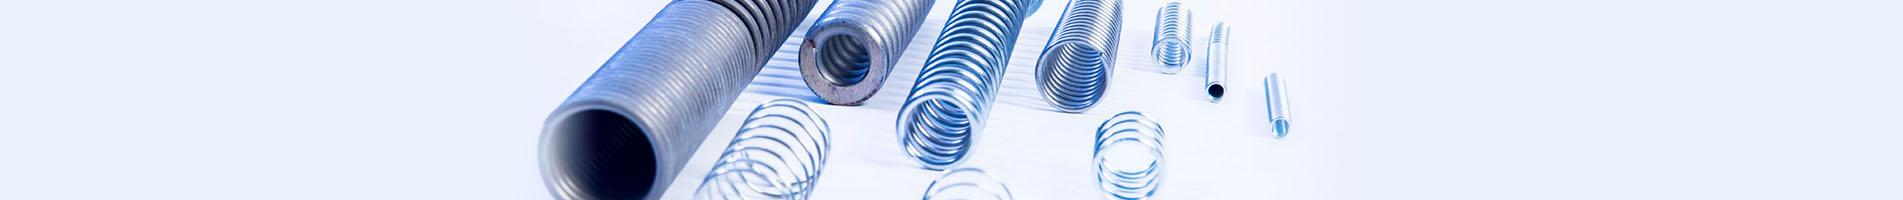 Compression Spring Manufacturer Compression Springs From